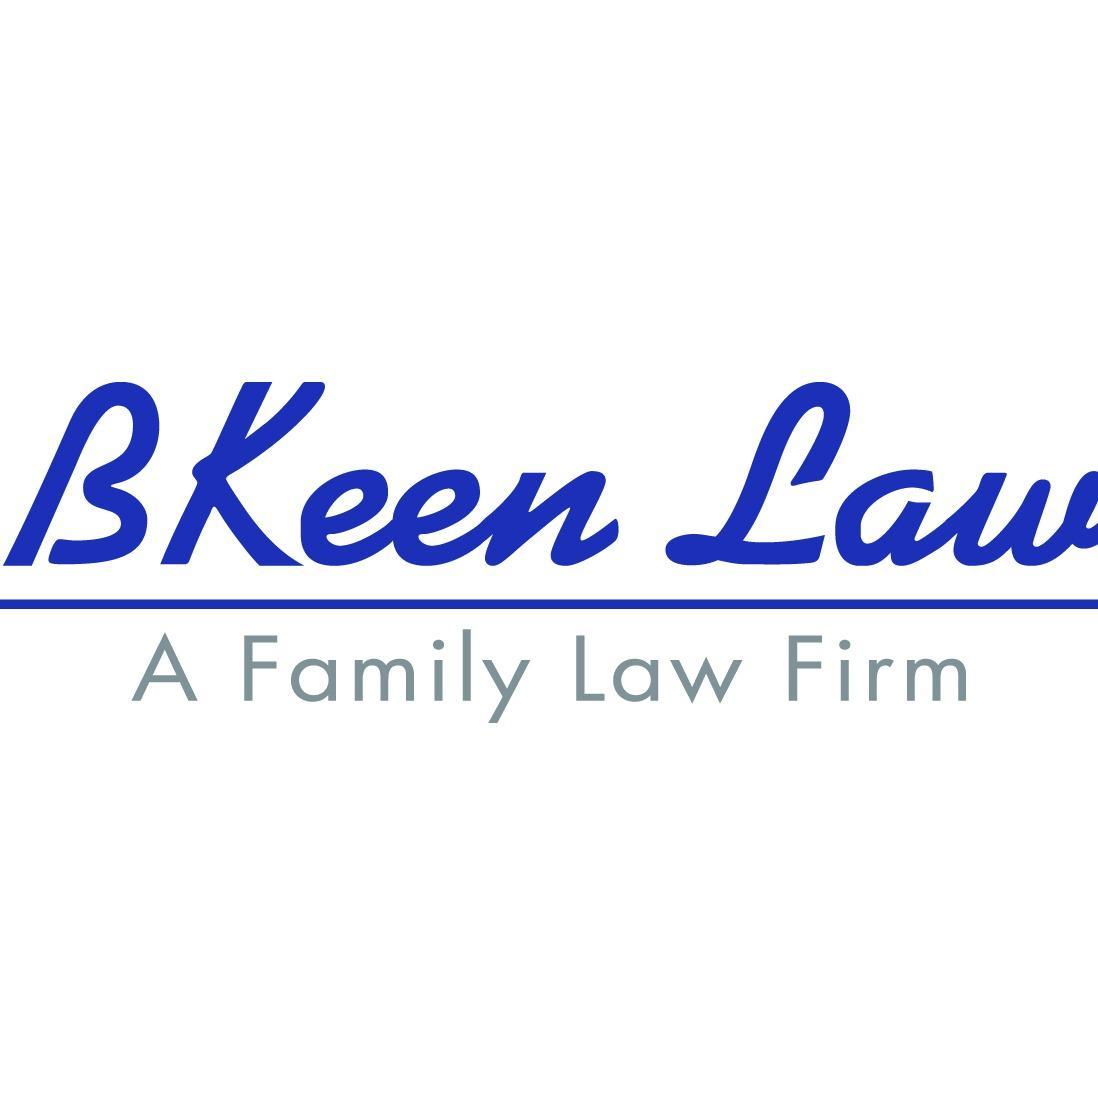 photo of BKeen Law